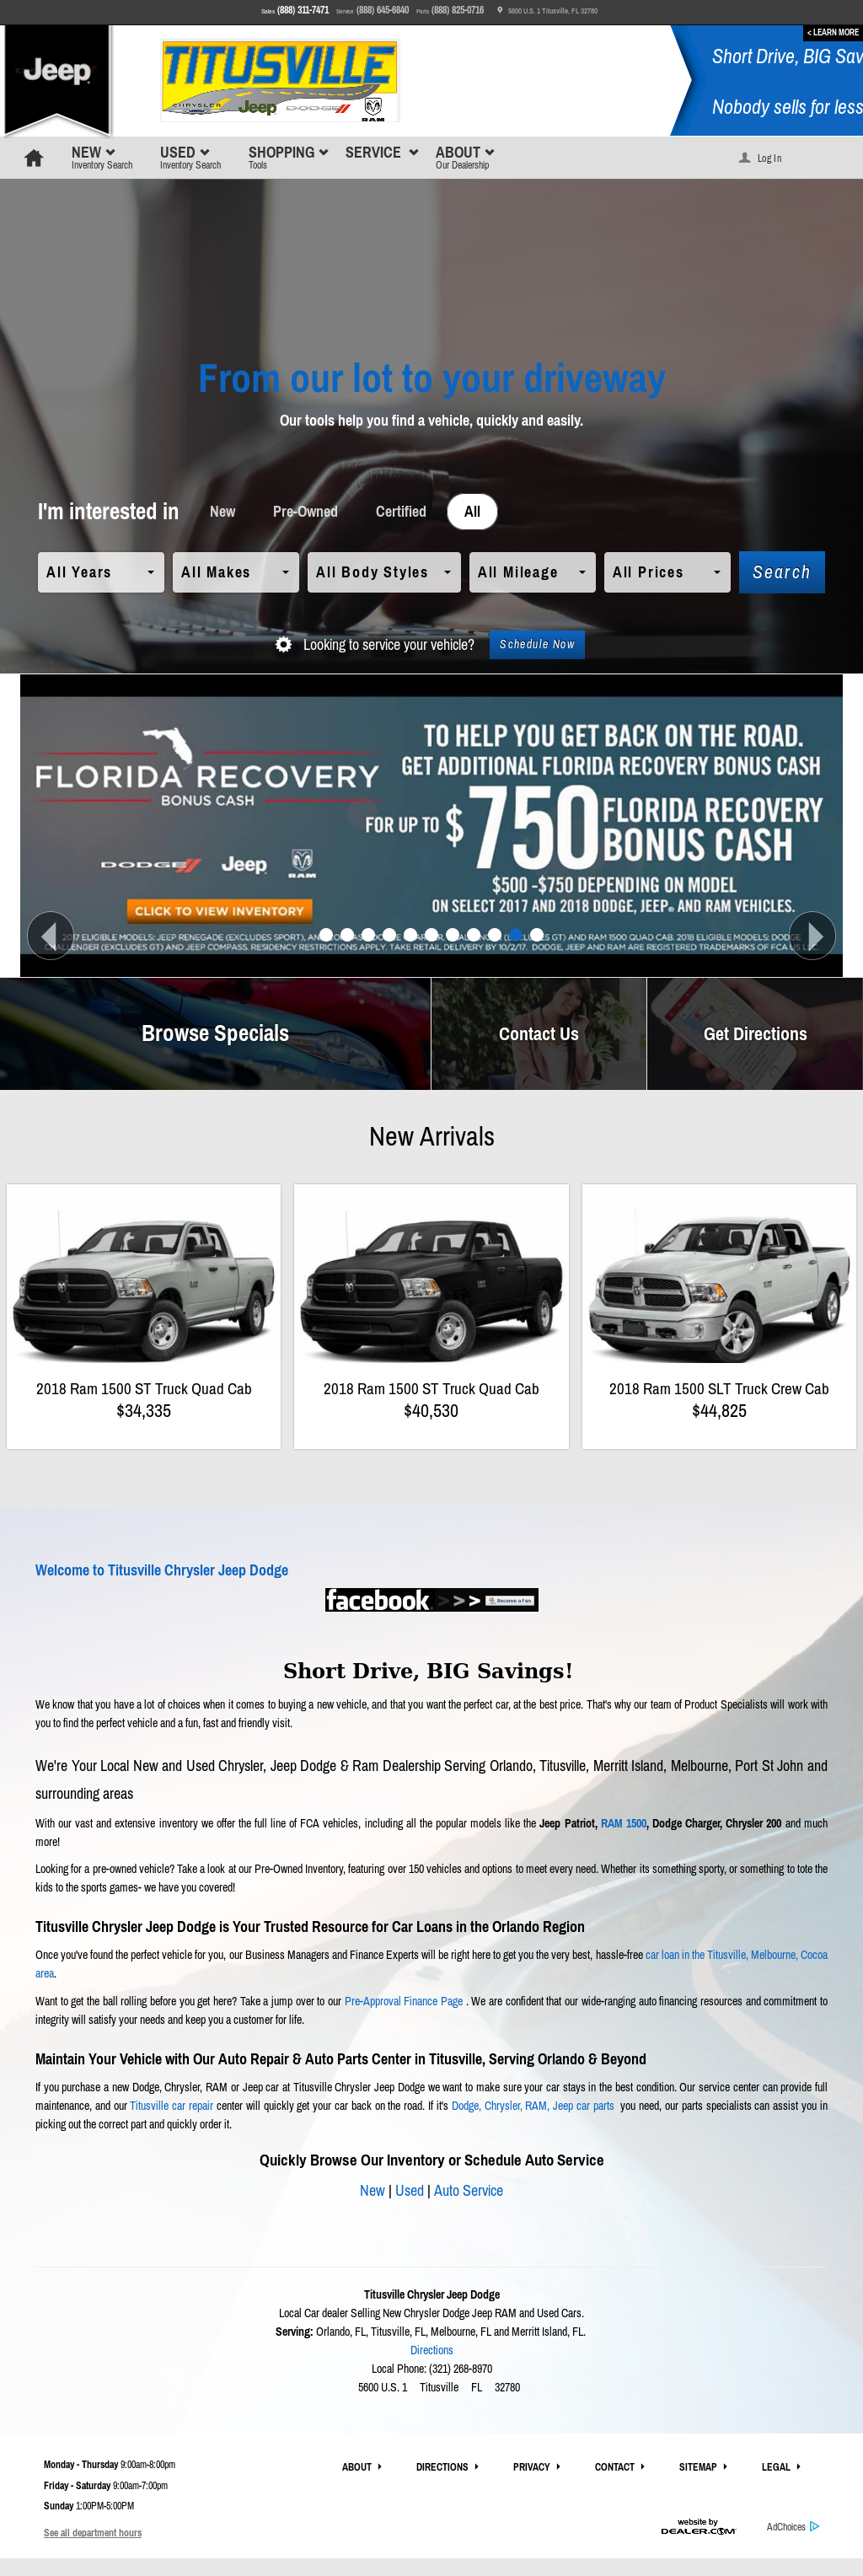 Titusville Chrysler Jeep Dodge Website History